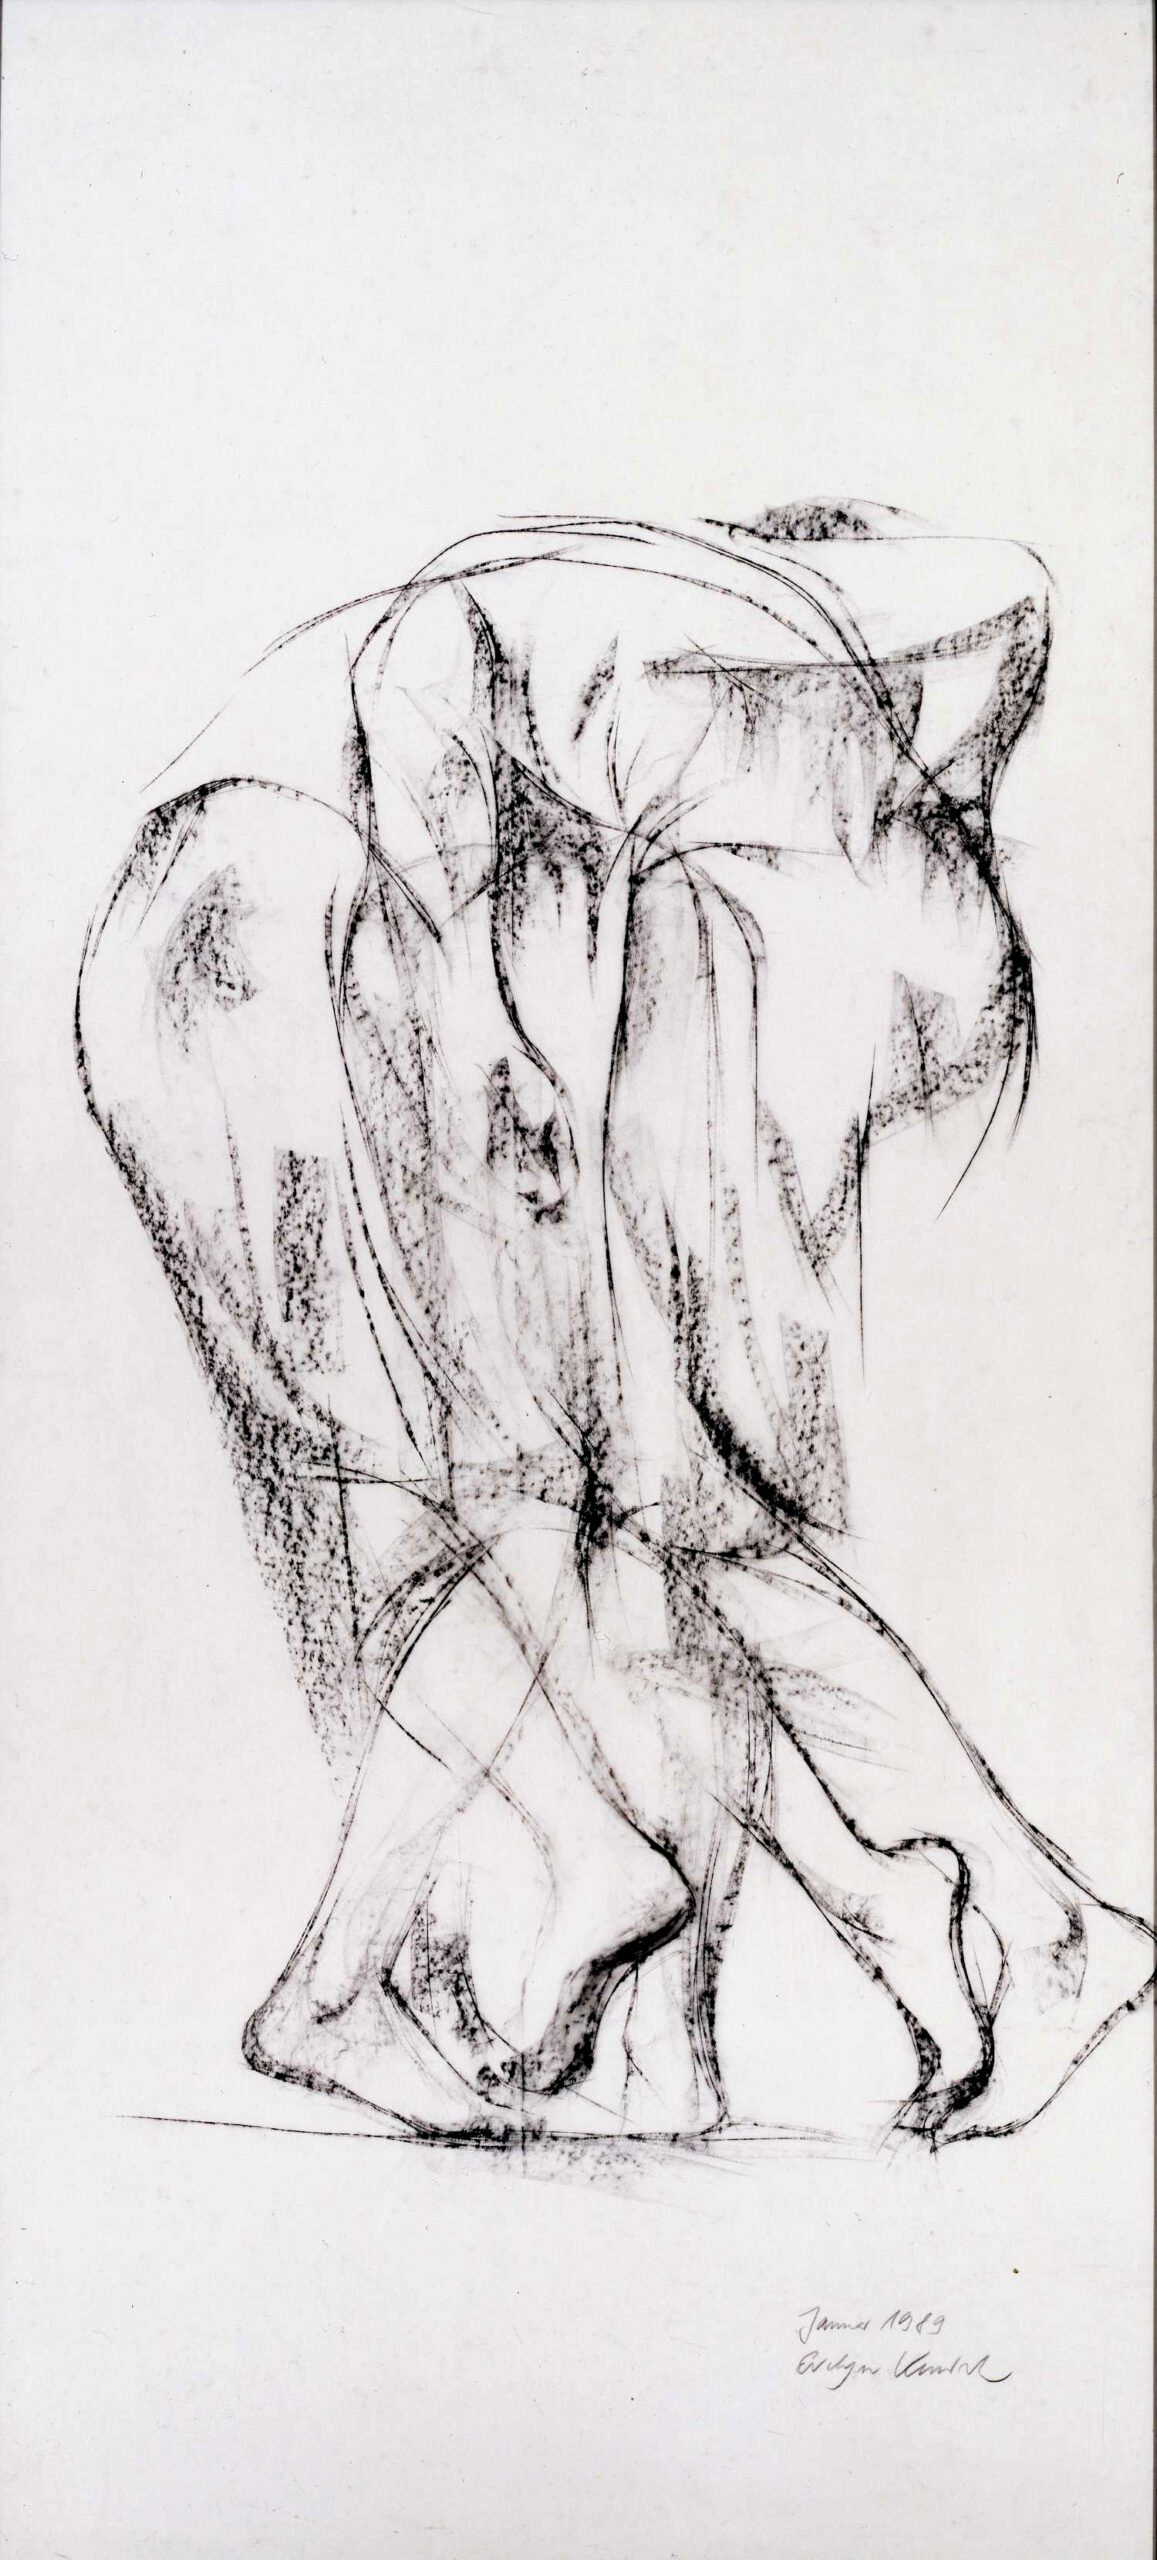 Slowmotion 1989, 180 / 90cm, Kreide / Transparentpapier